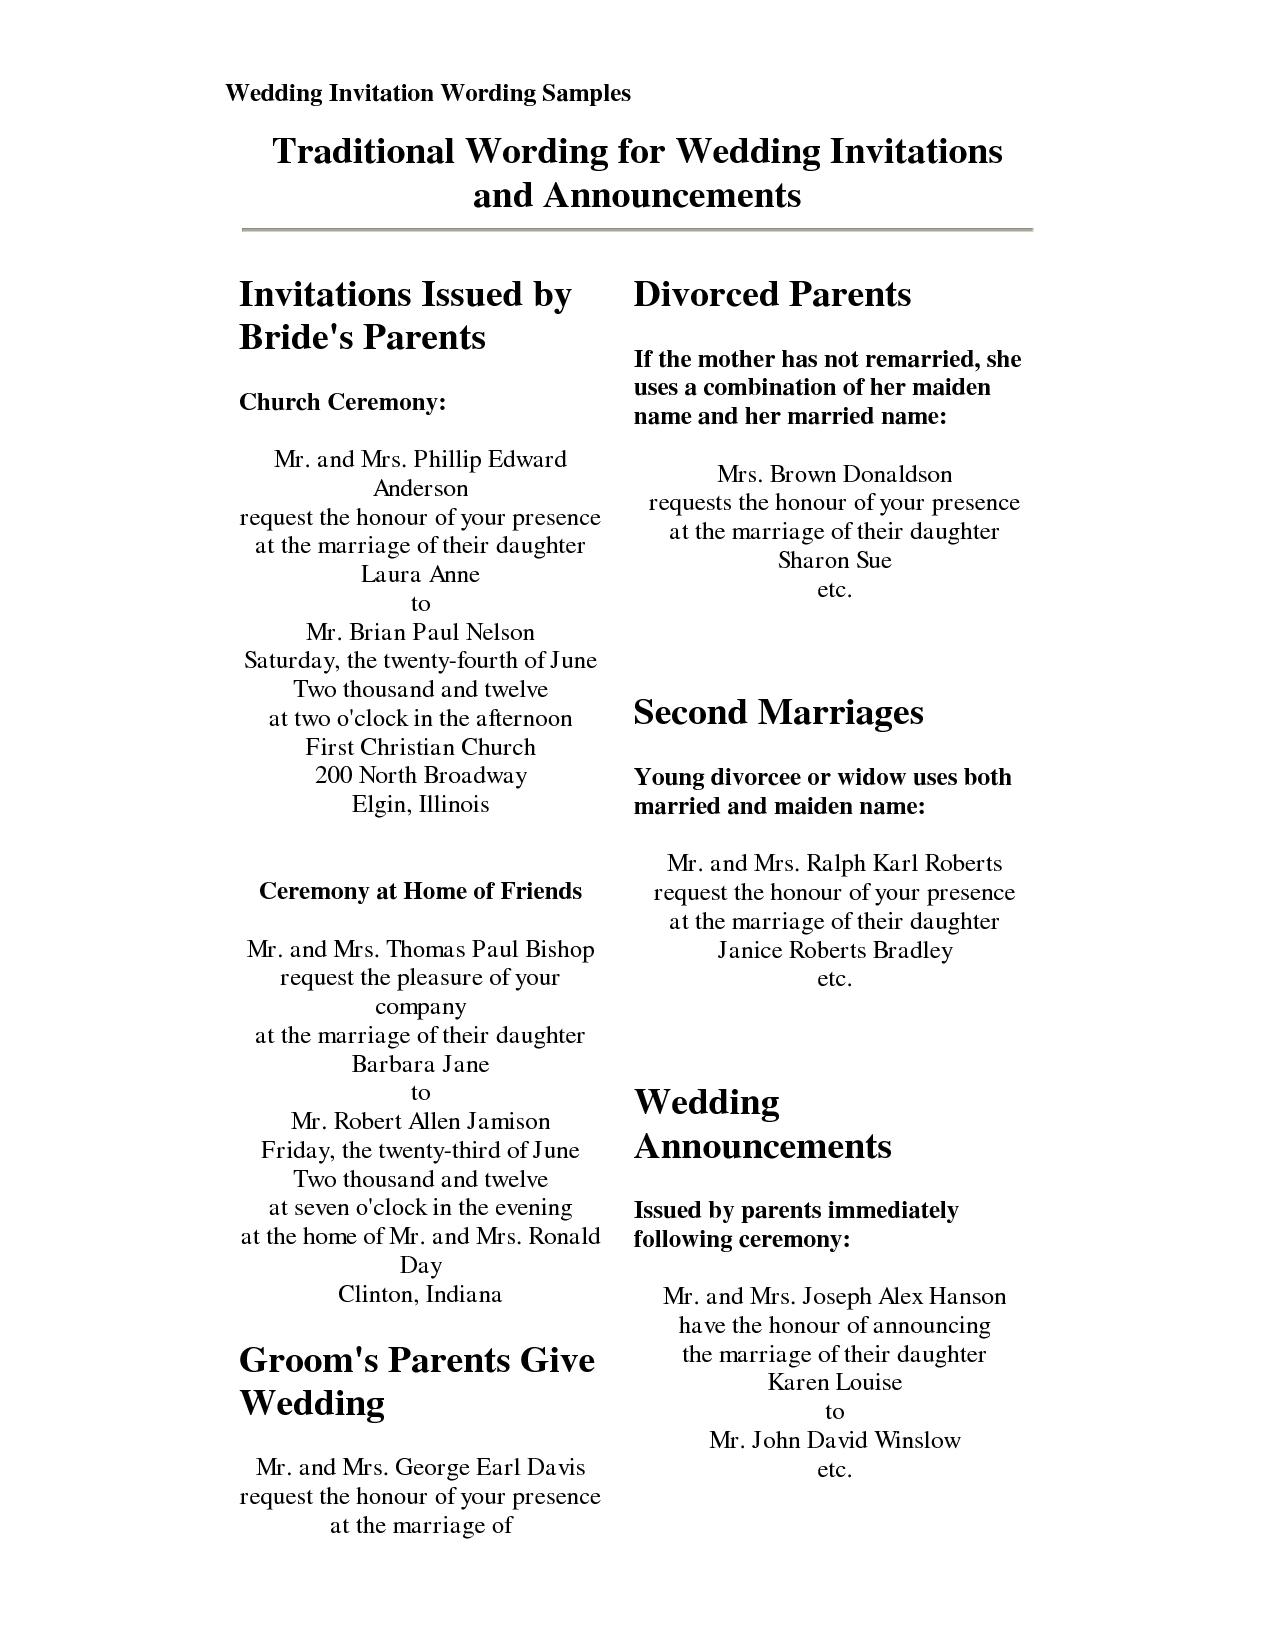 1650 · 129 kB · png, Formal Wedding Invitation Wordin